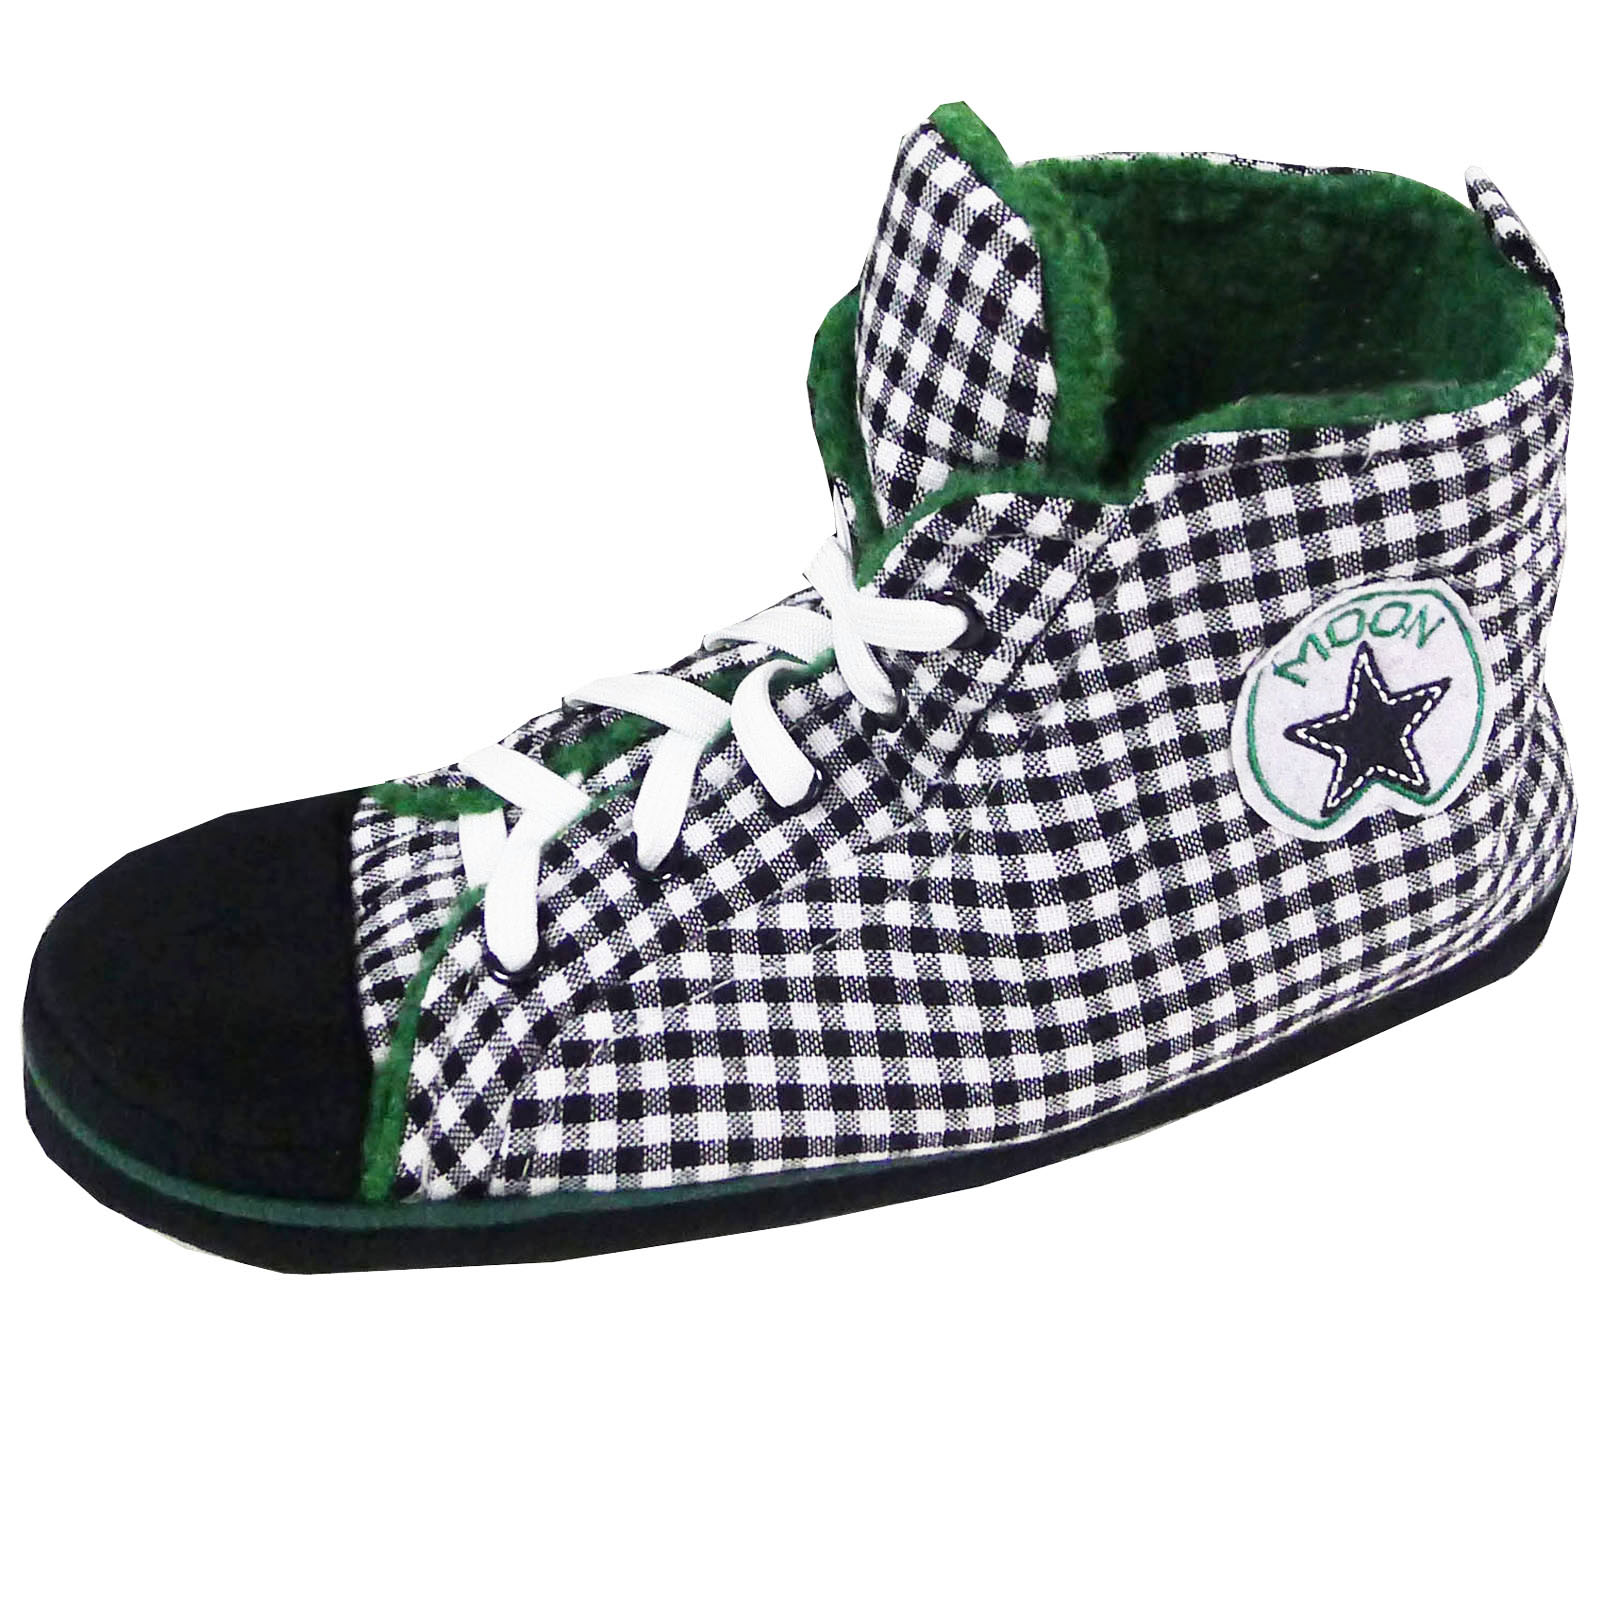 Womens Fleece Lined Slip On Shoes